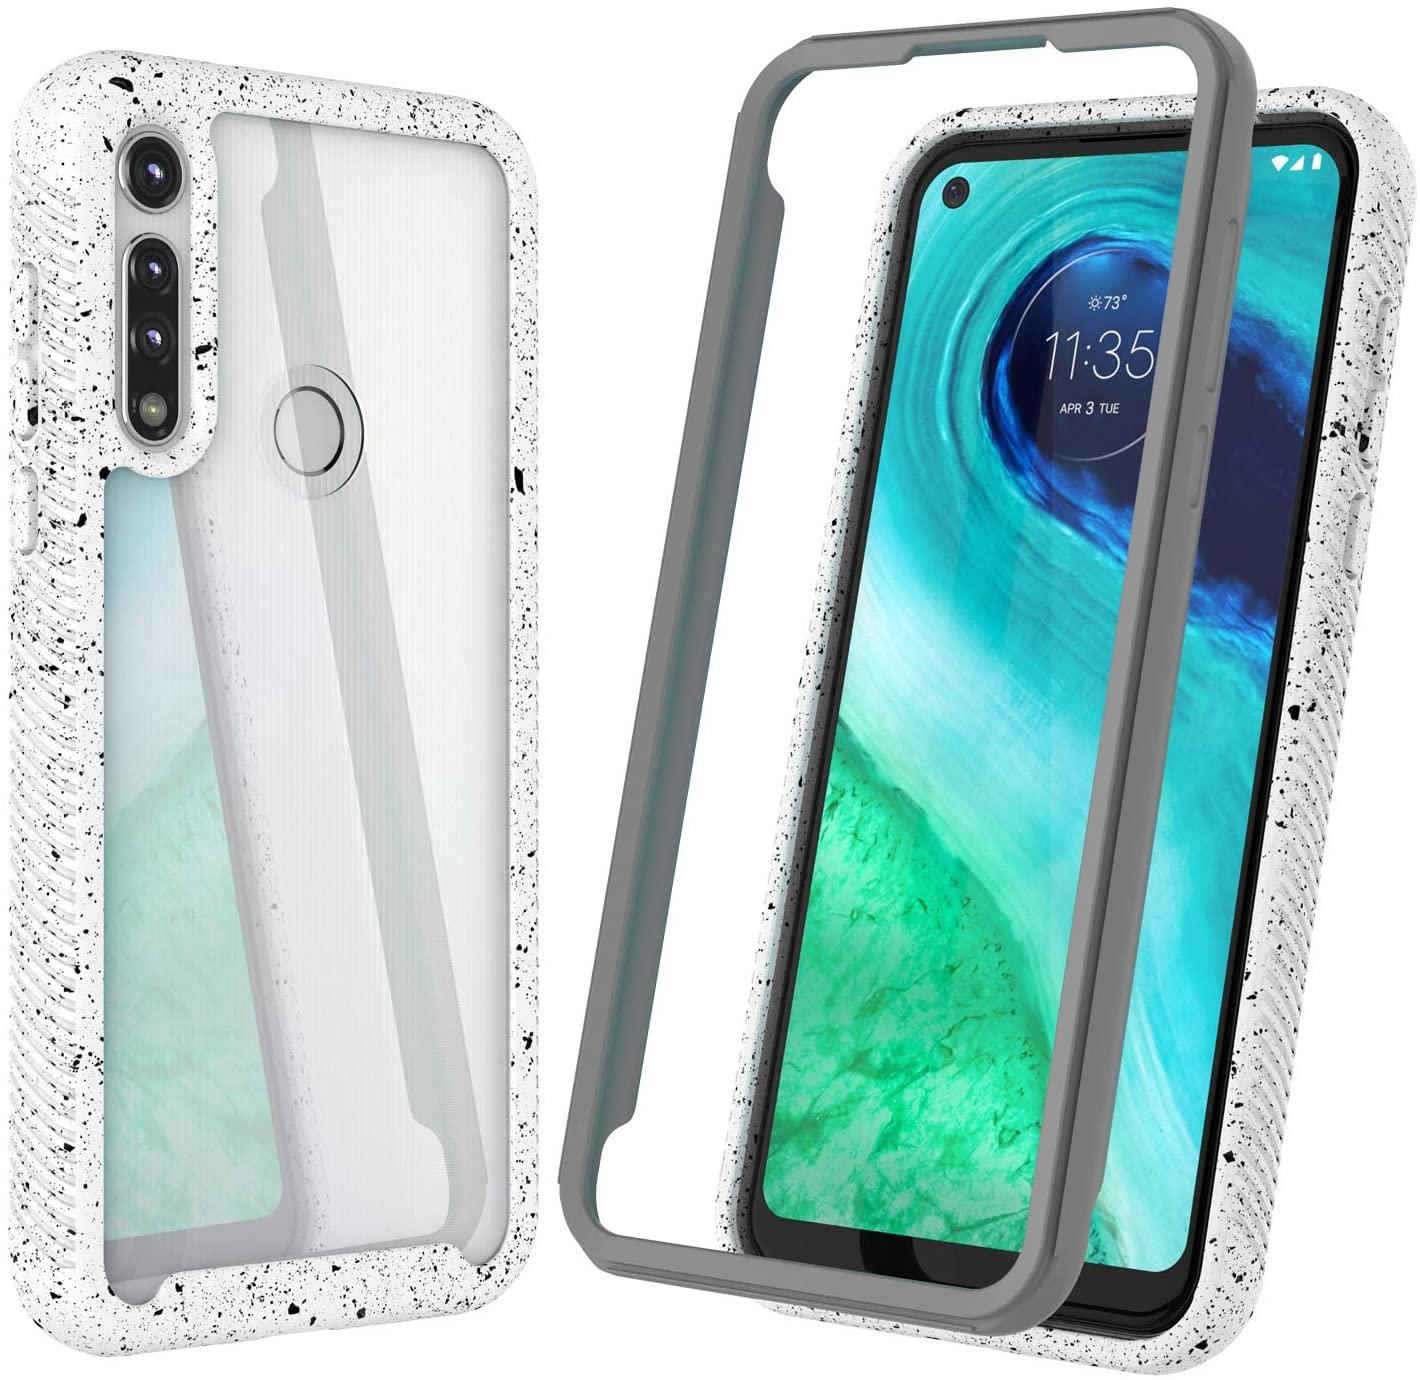 Njjex Moto G Fast Case, Motorola G Fast Case 2020, [Npatt] Hybrid Impact Transparent Clear Back Soft TPU Bumper Case + PC Plastic Front Cover Shockproof Phone Cover for Motorola G Fast [White]